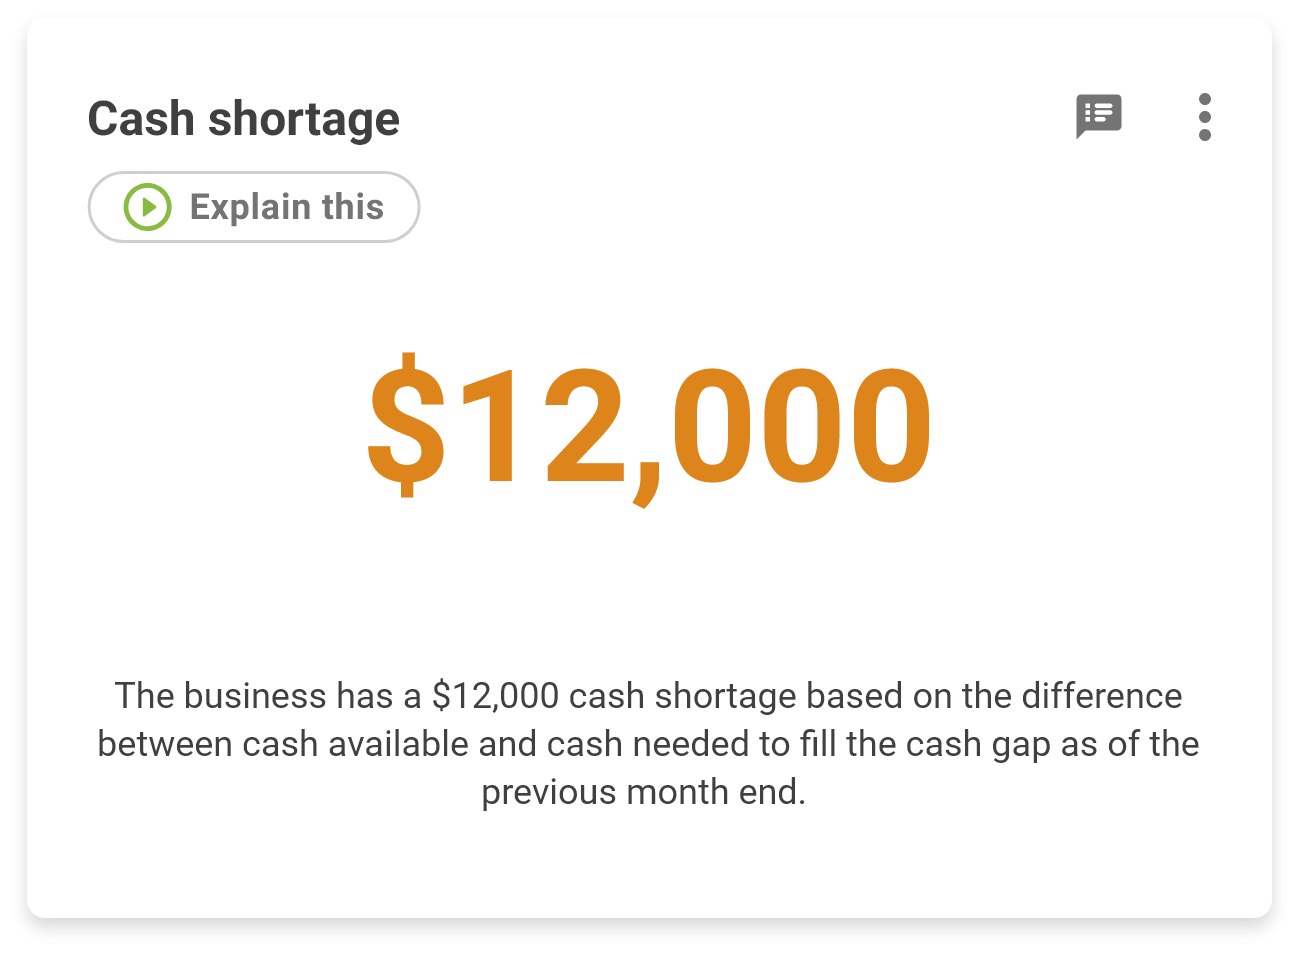 Cash shortage@3x